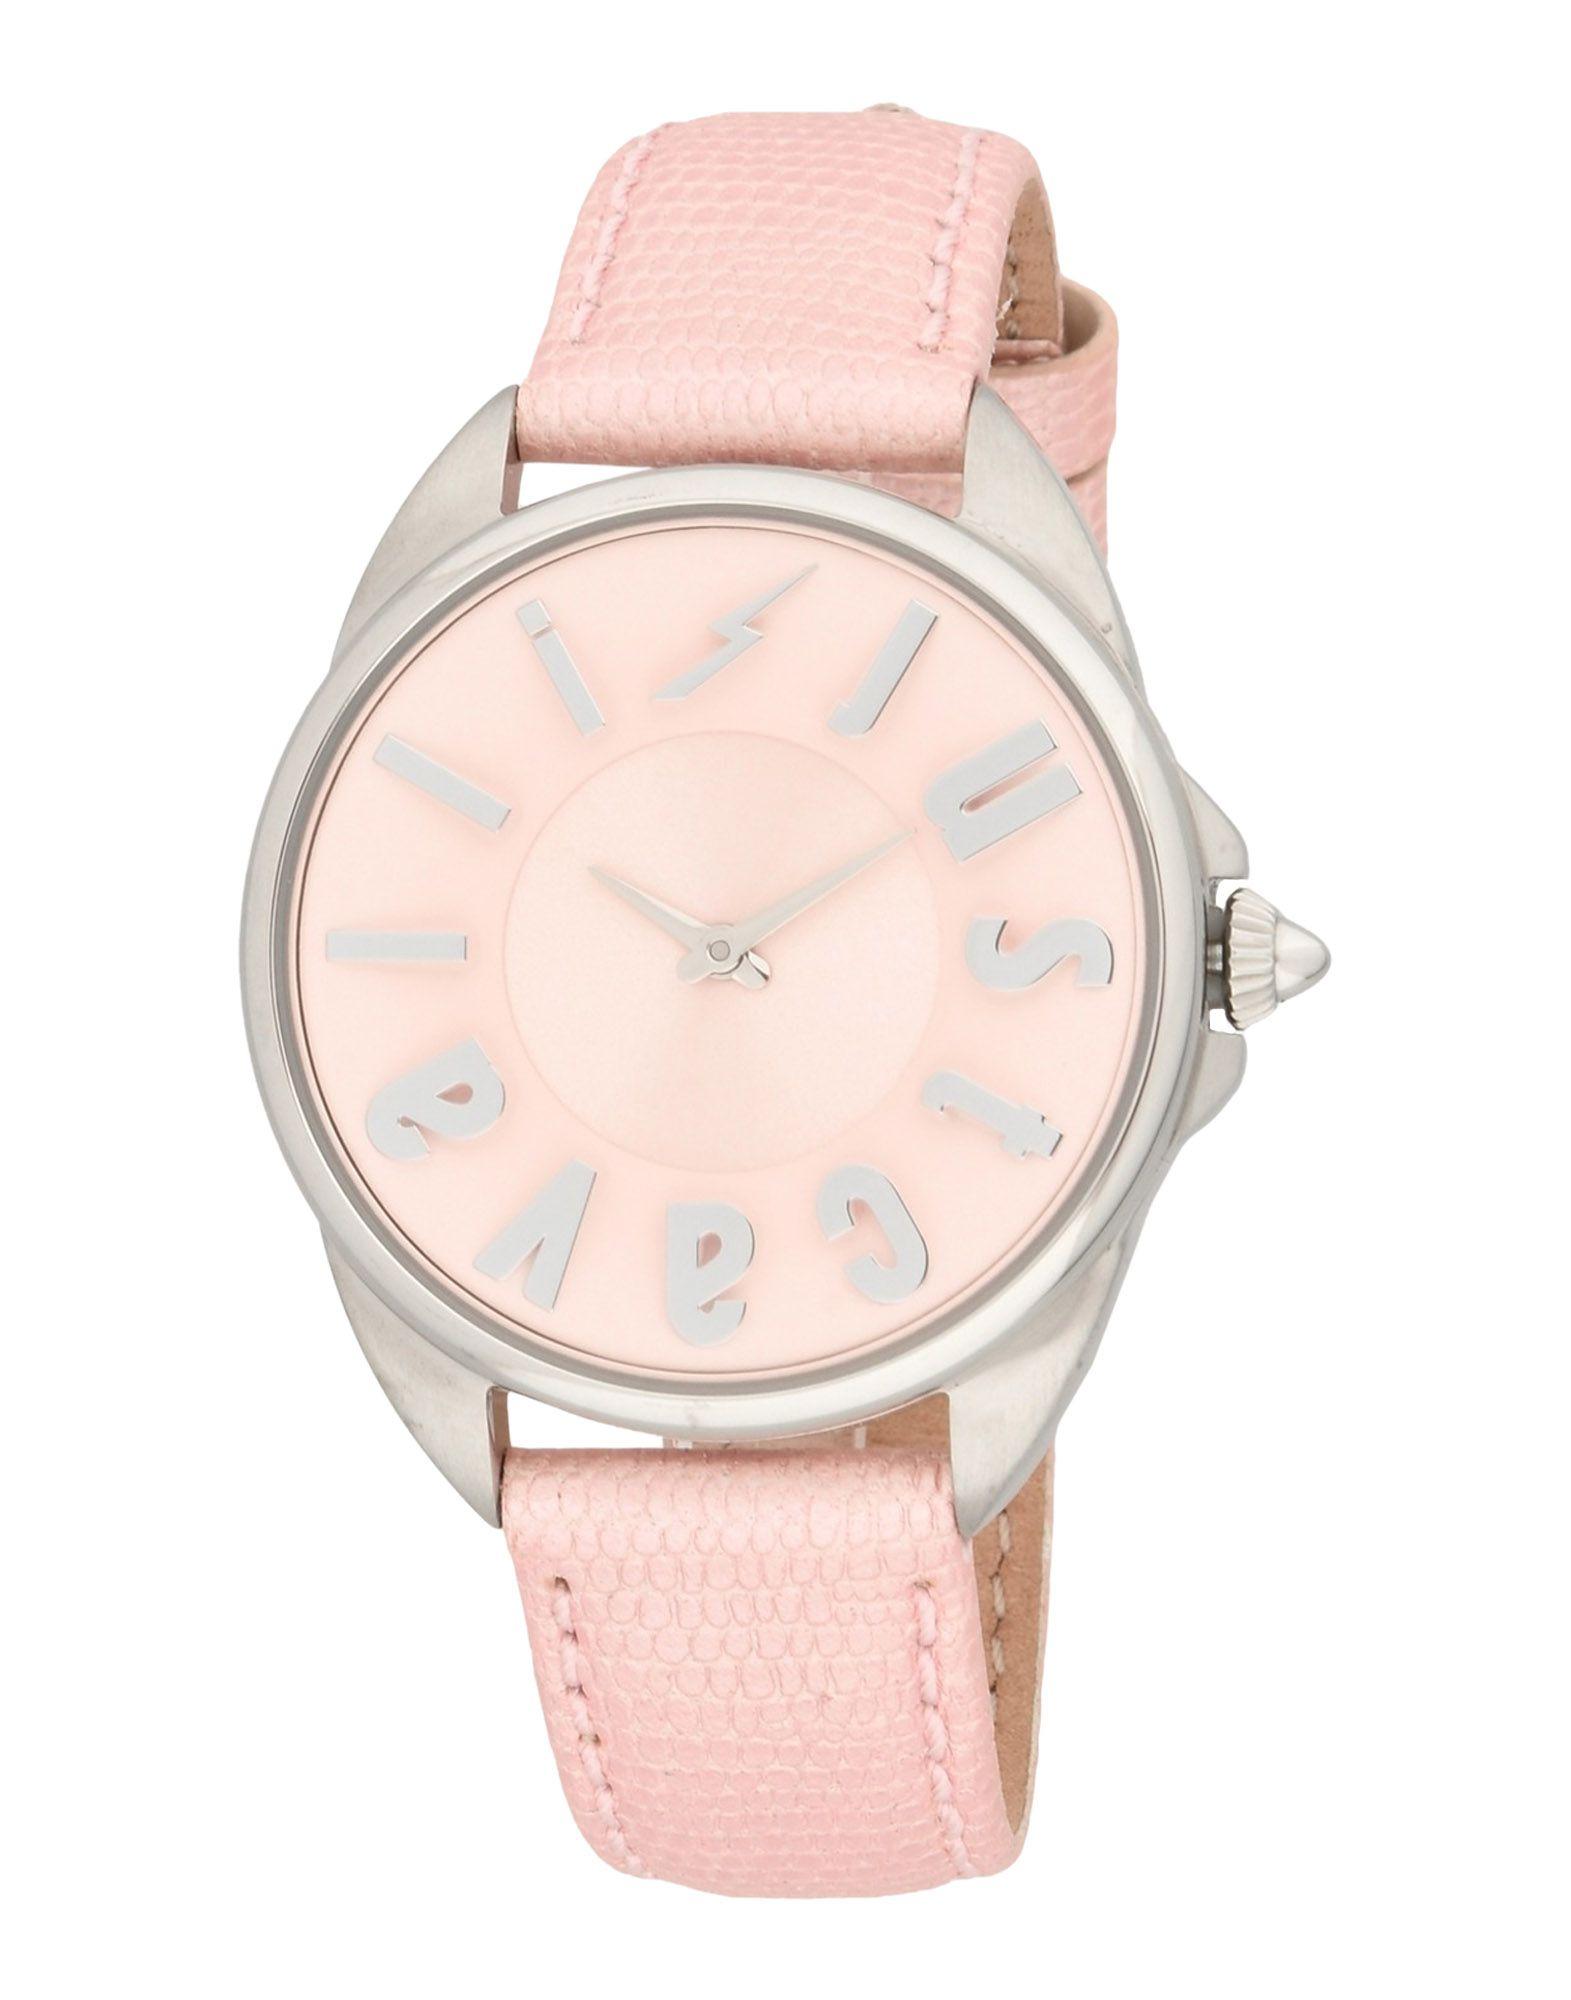 JUST CAVALLI Наручные часы часы just cavalli r7251532504